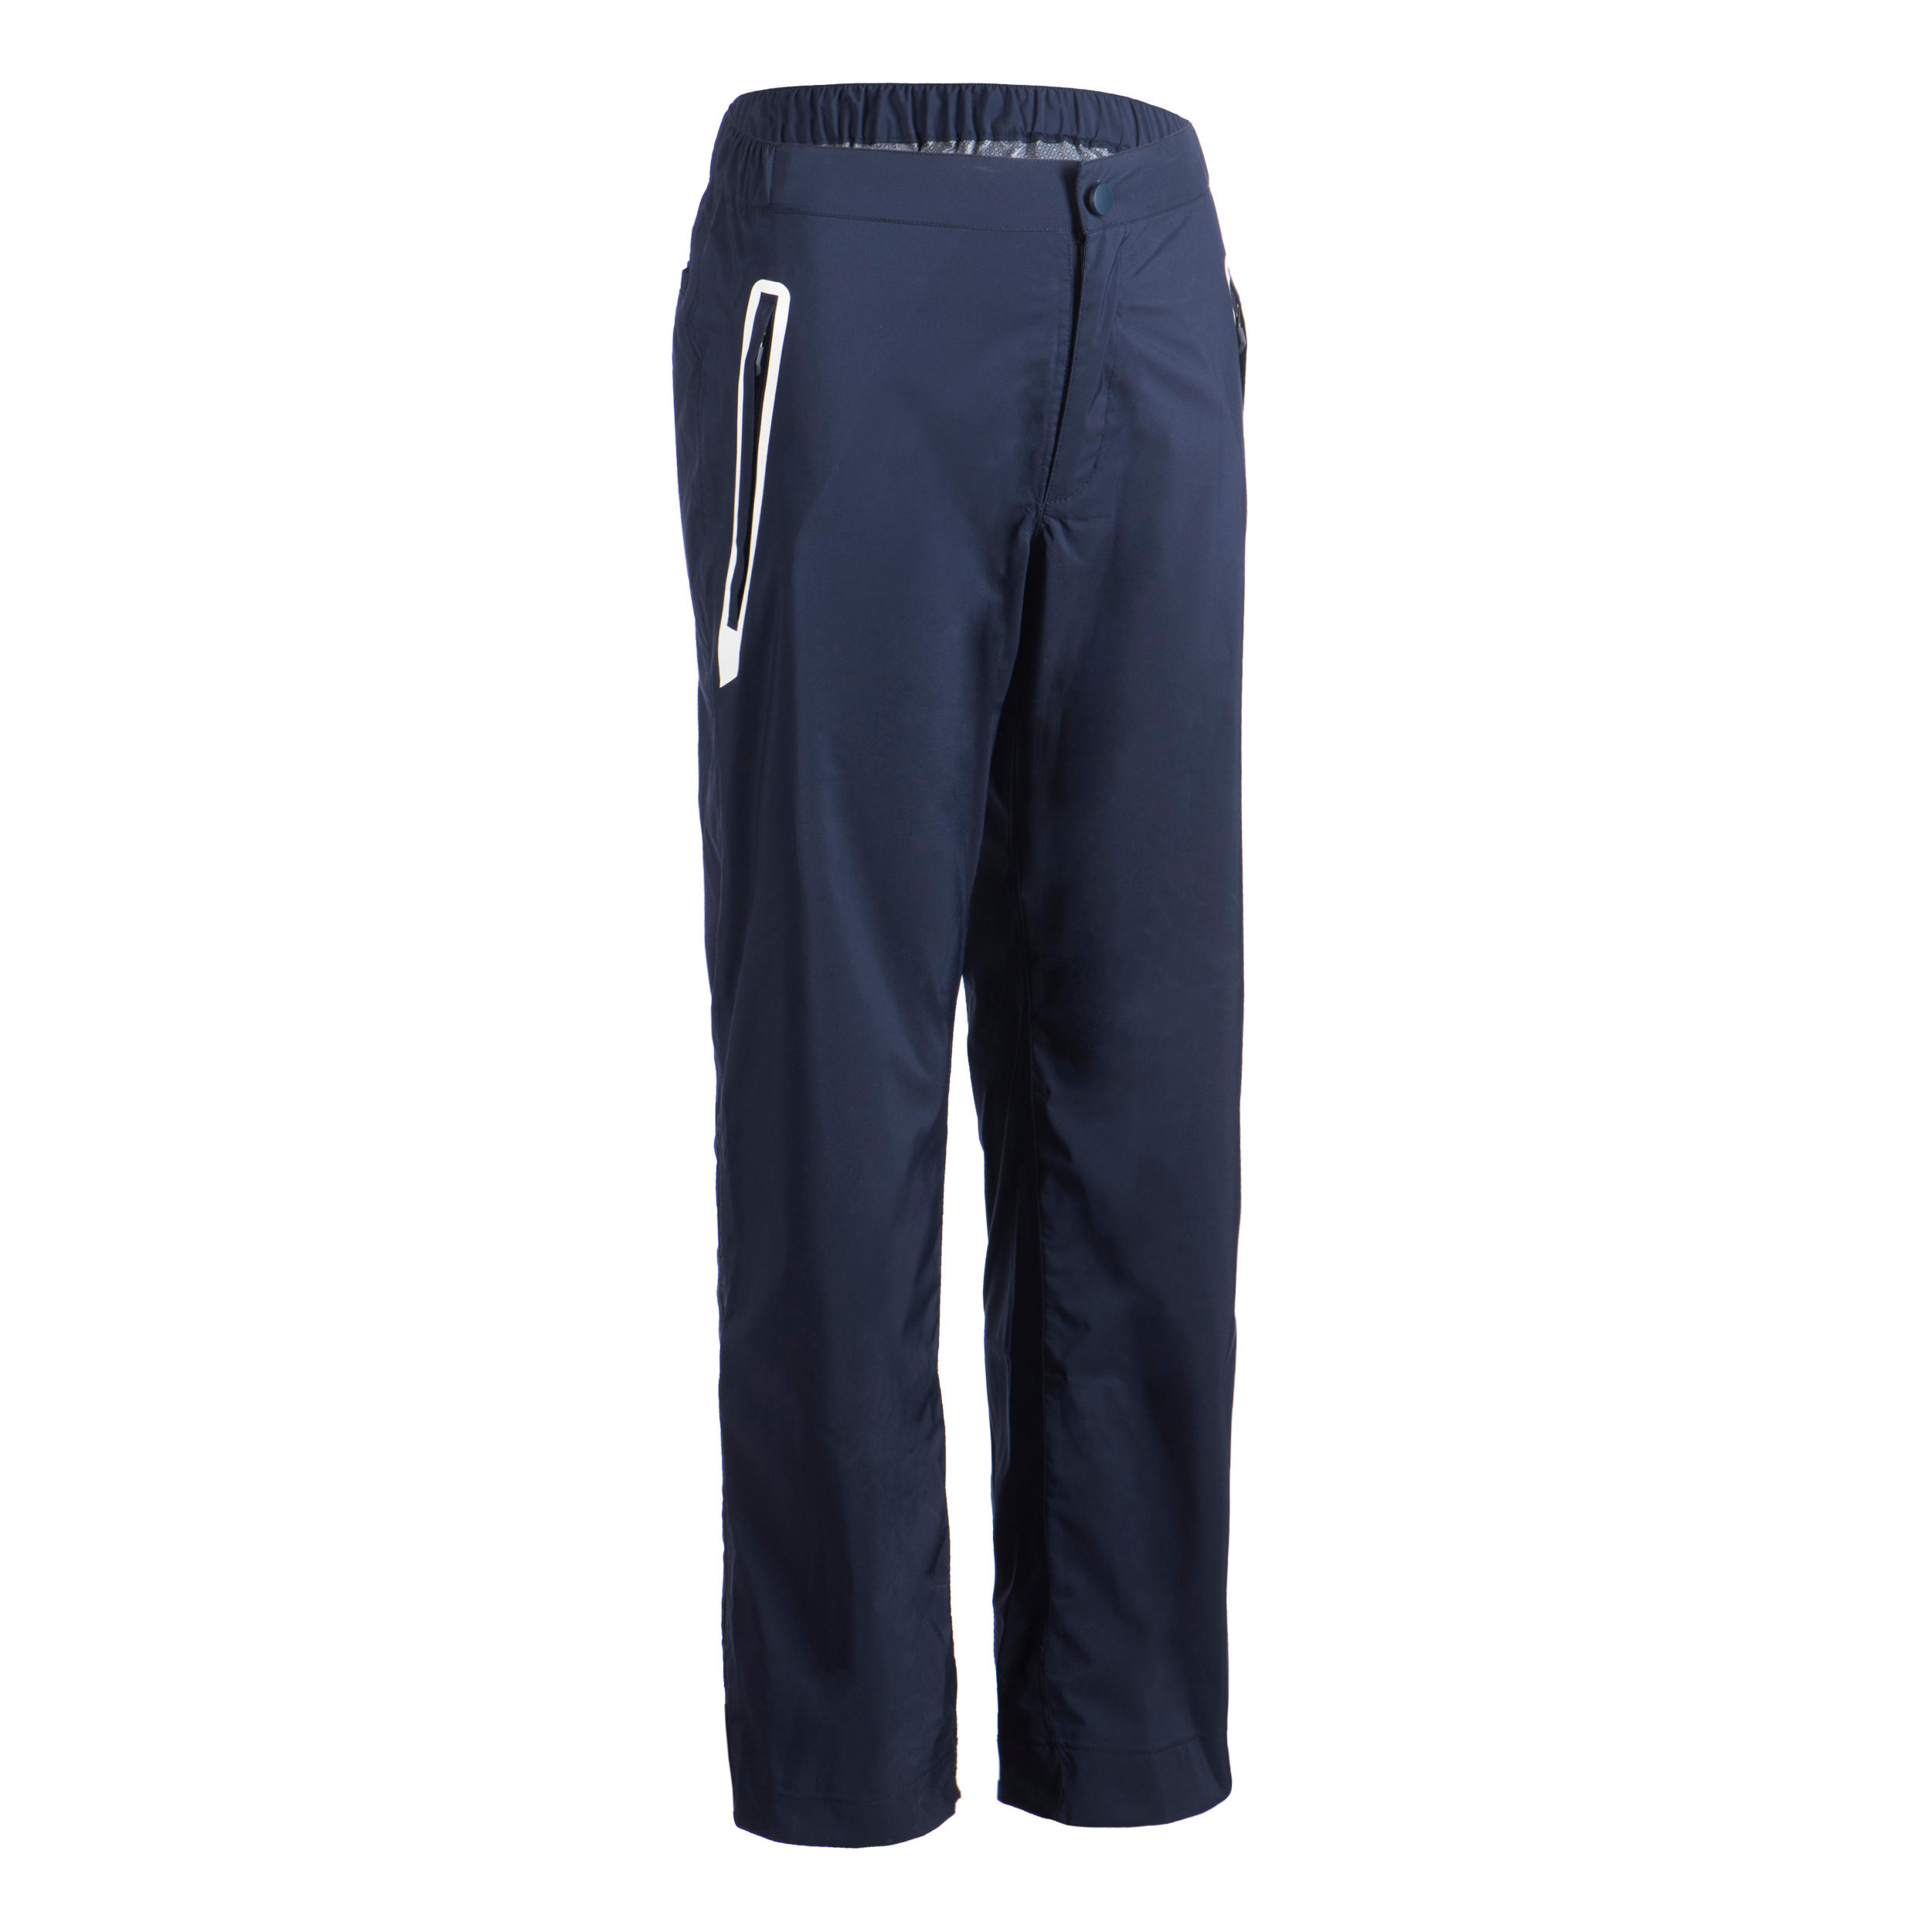 Pantalon Impermeabil Copii la Reducere poza